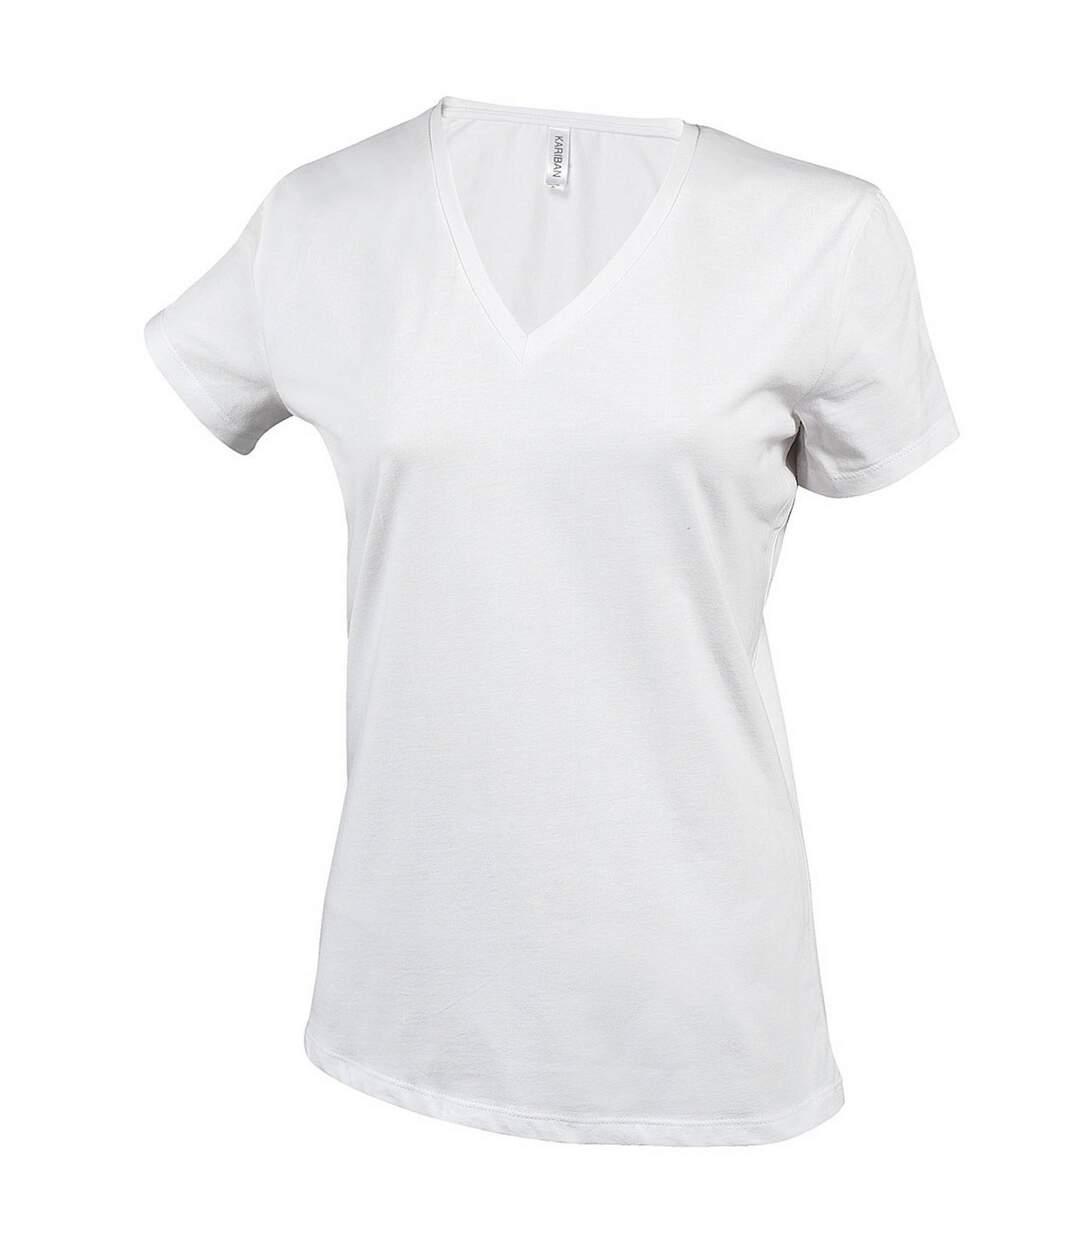 Kariban - T-Shirt À Manches Courtes Et Col En V - Femme (Blanc) - UTRW711